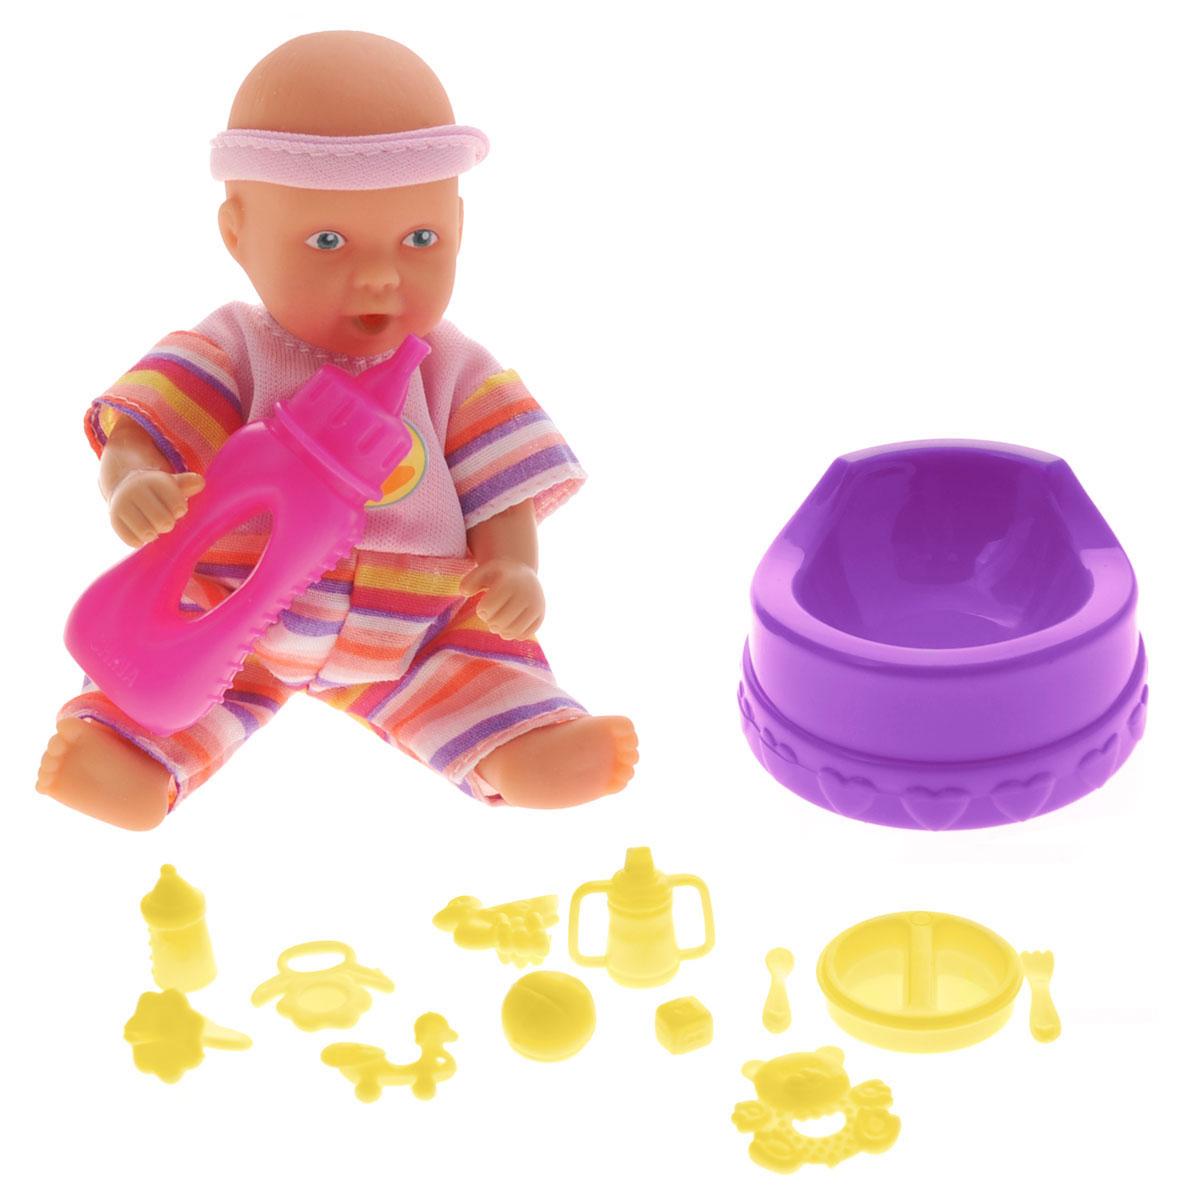 Simba Пупс Mini New Born Baby цвет бутылочки розовый baby born ботиночки для кукол цвет голубой белый оранжевый 2 пары